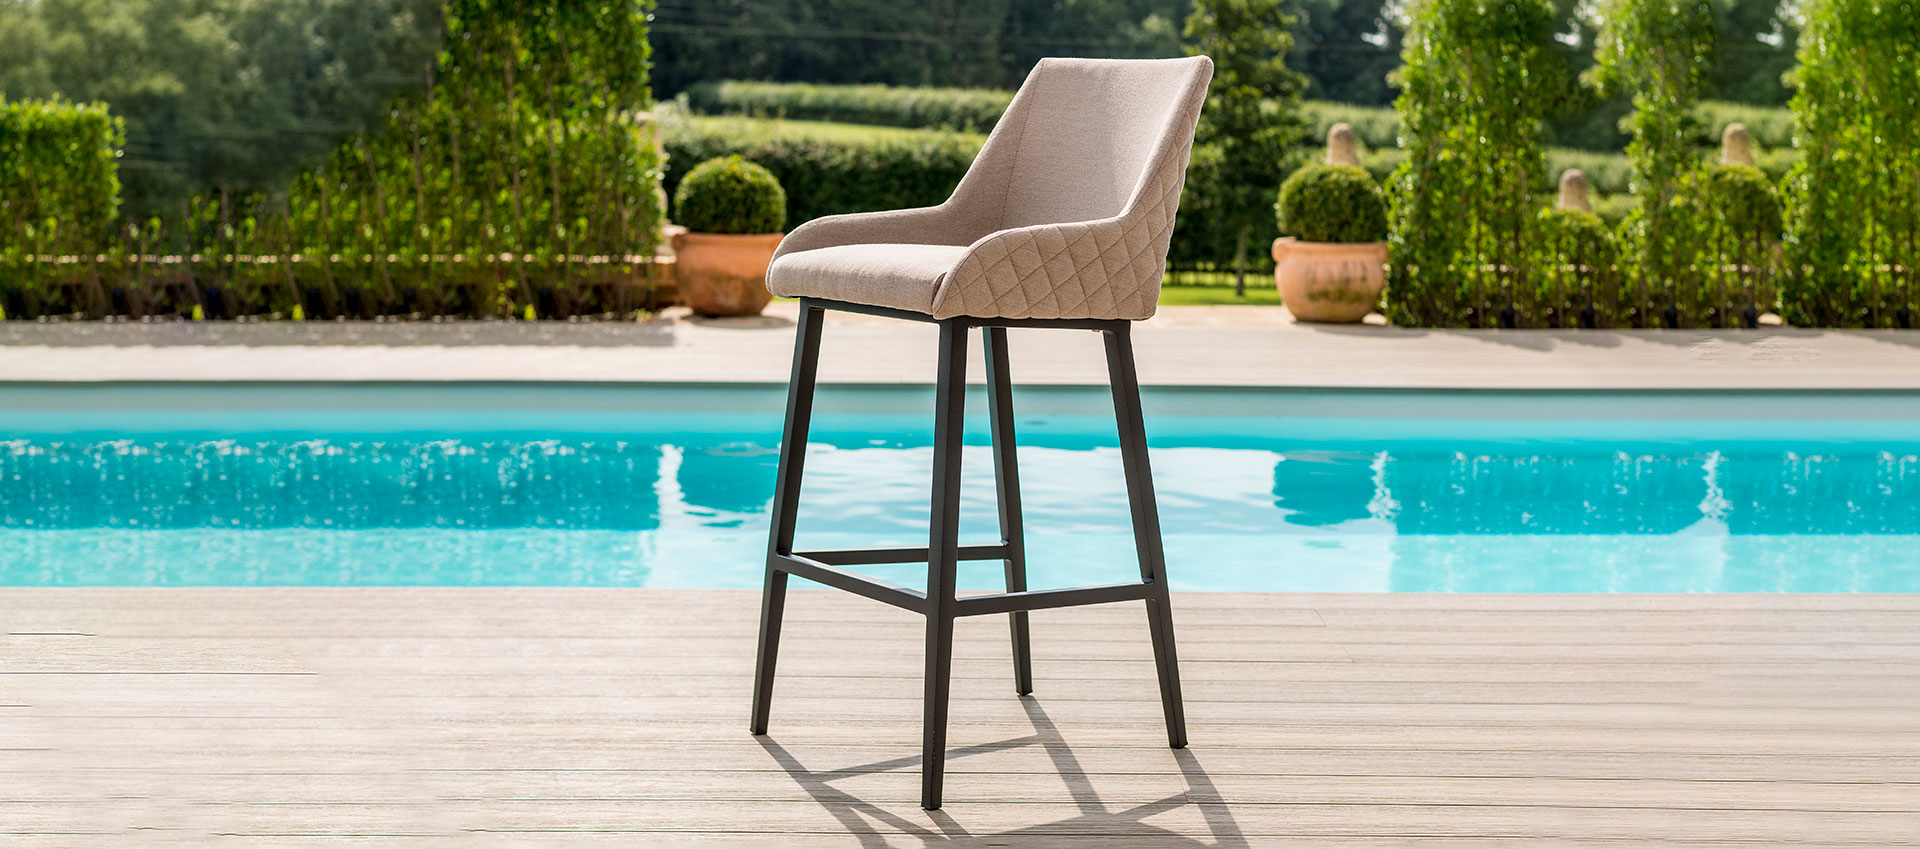 Maze Lounge - Outdoor Fabric Regal Bar Stool - Taupe